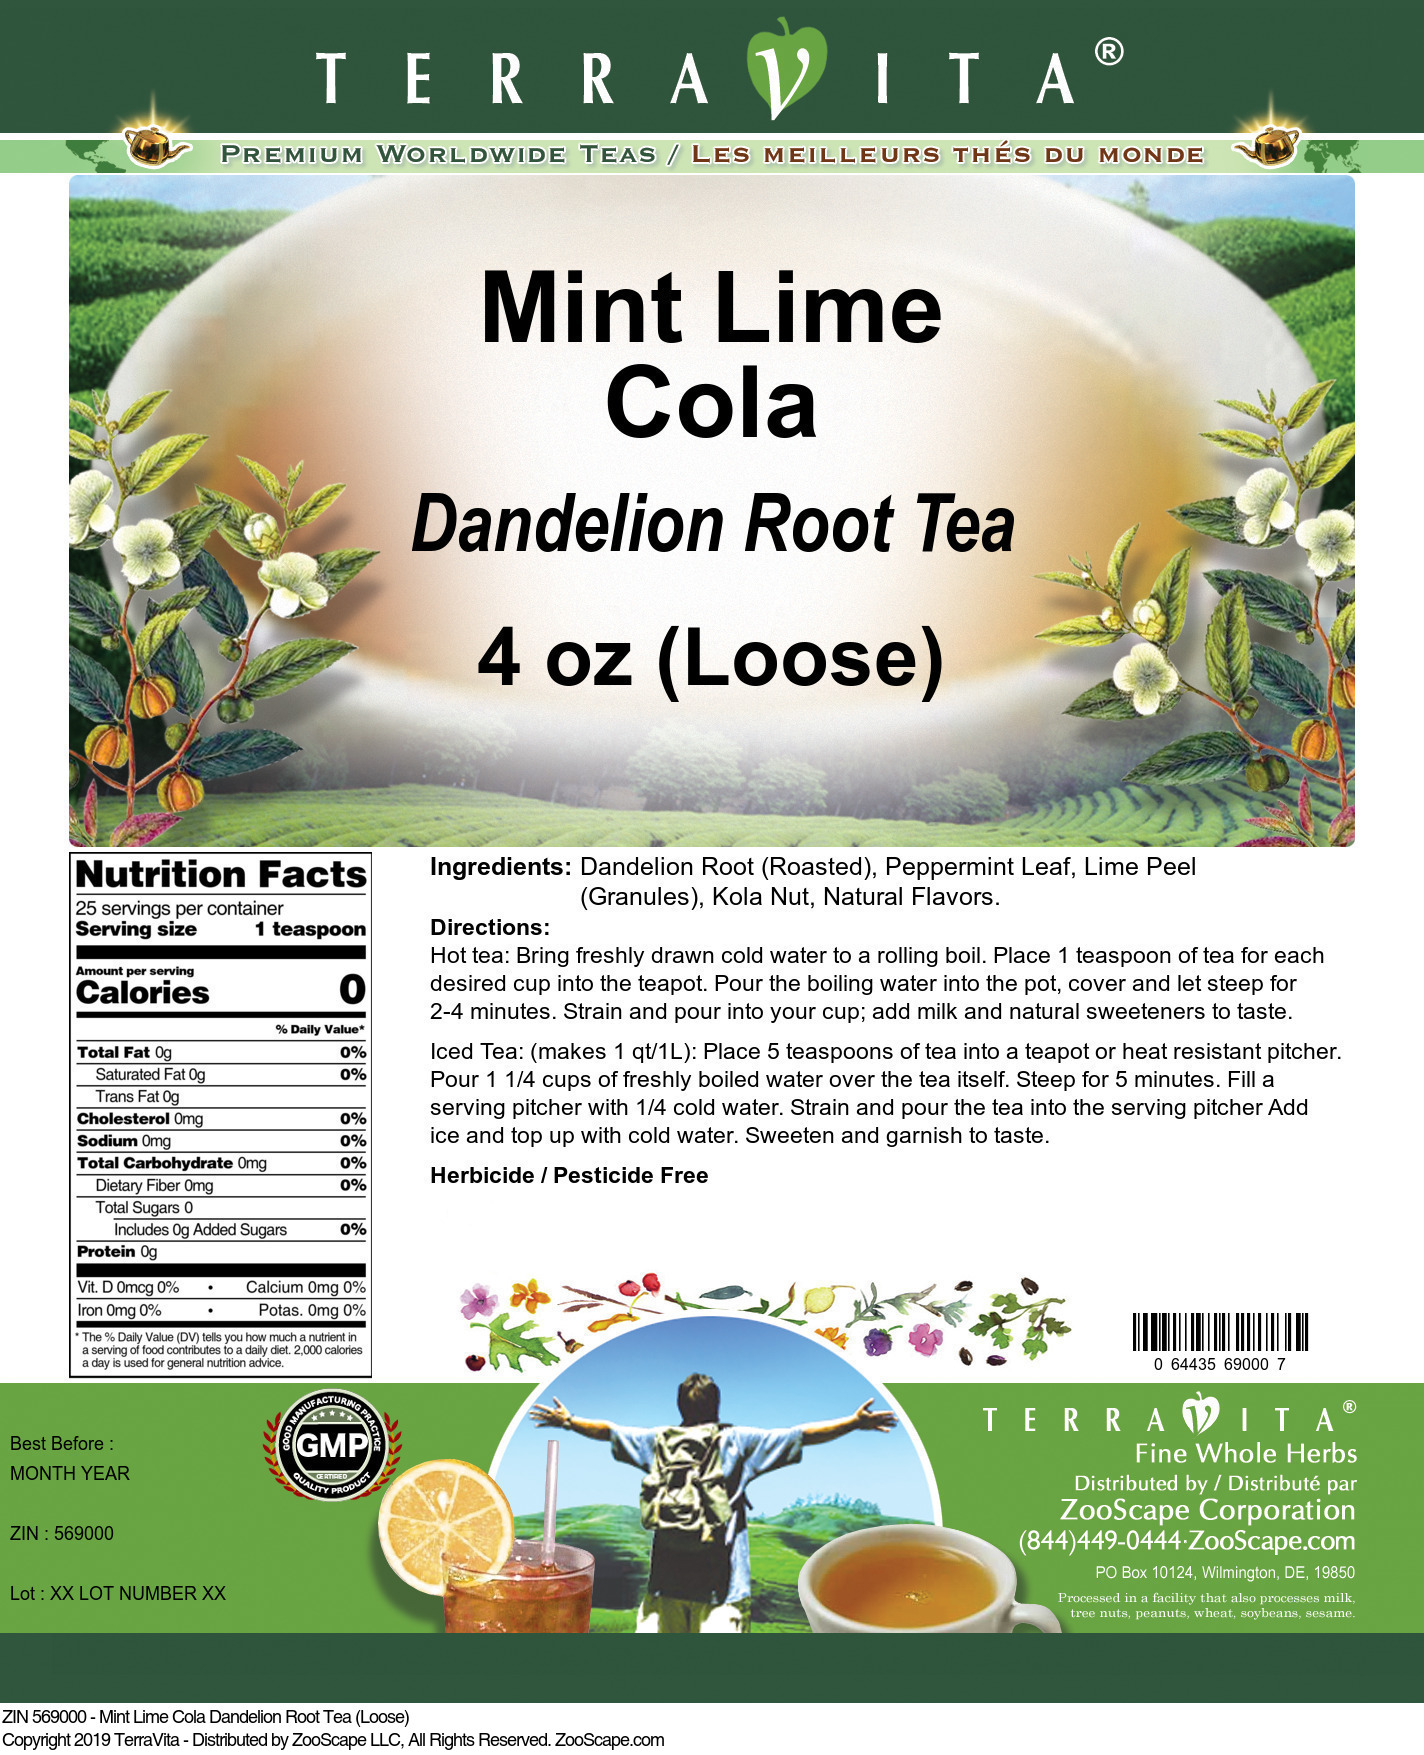 Mint Lime Cola Dandelion Root Tea (Loose)